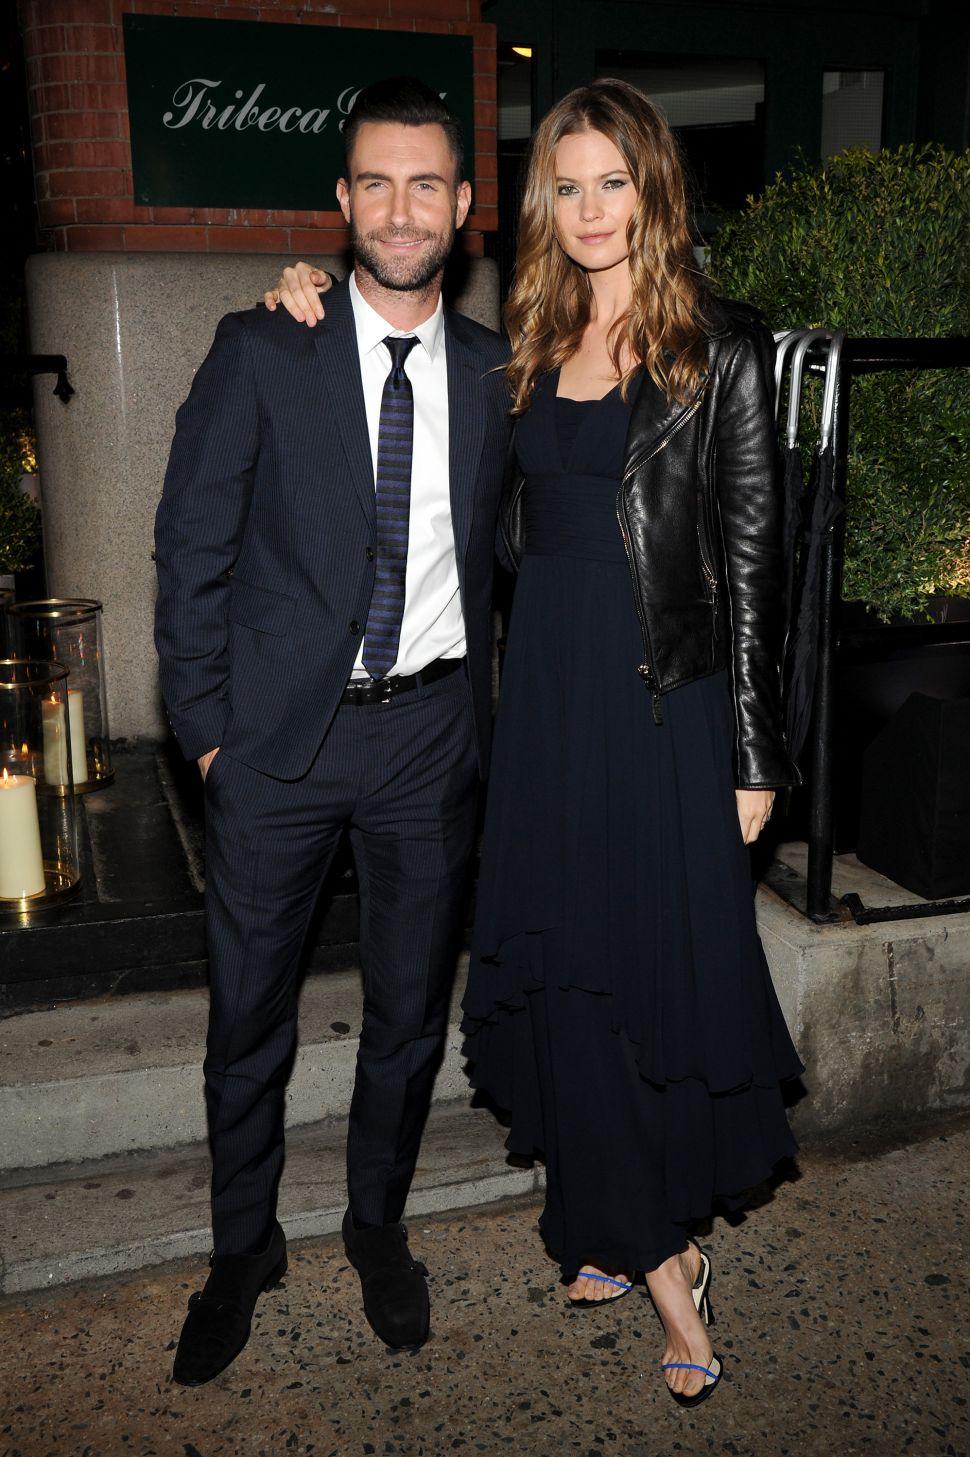 Just One More Night for Adam Levine and Behati Prinsloo's Soho Loft